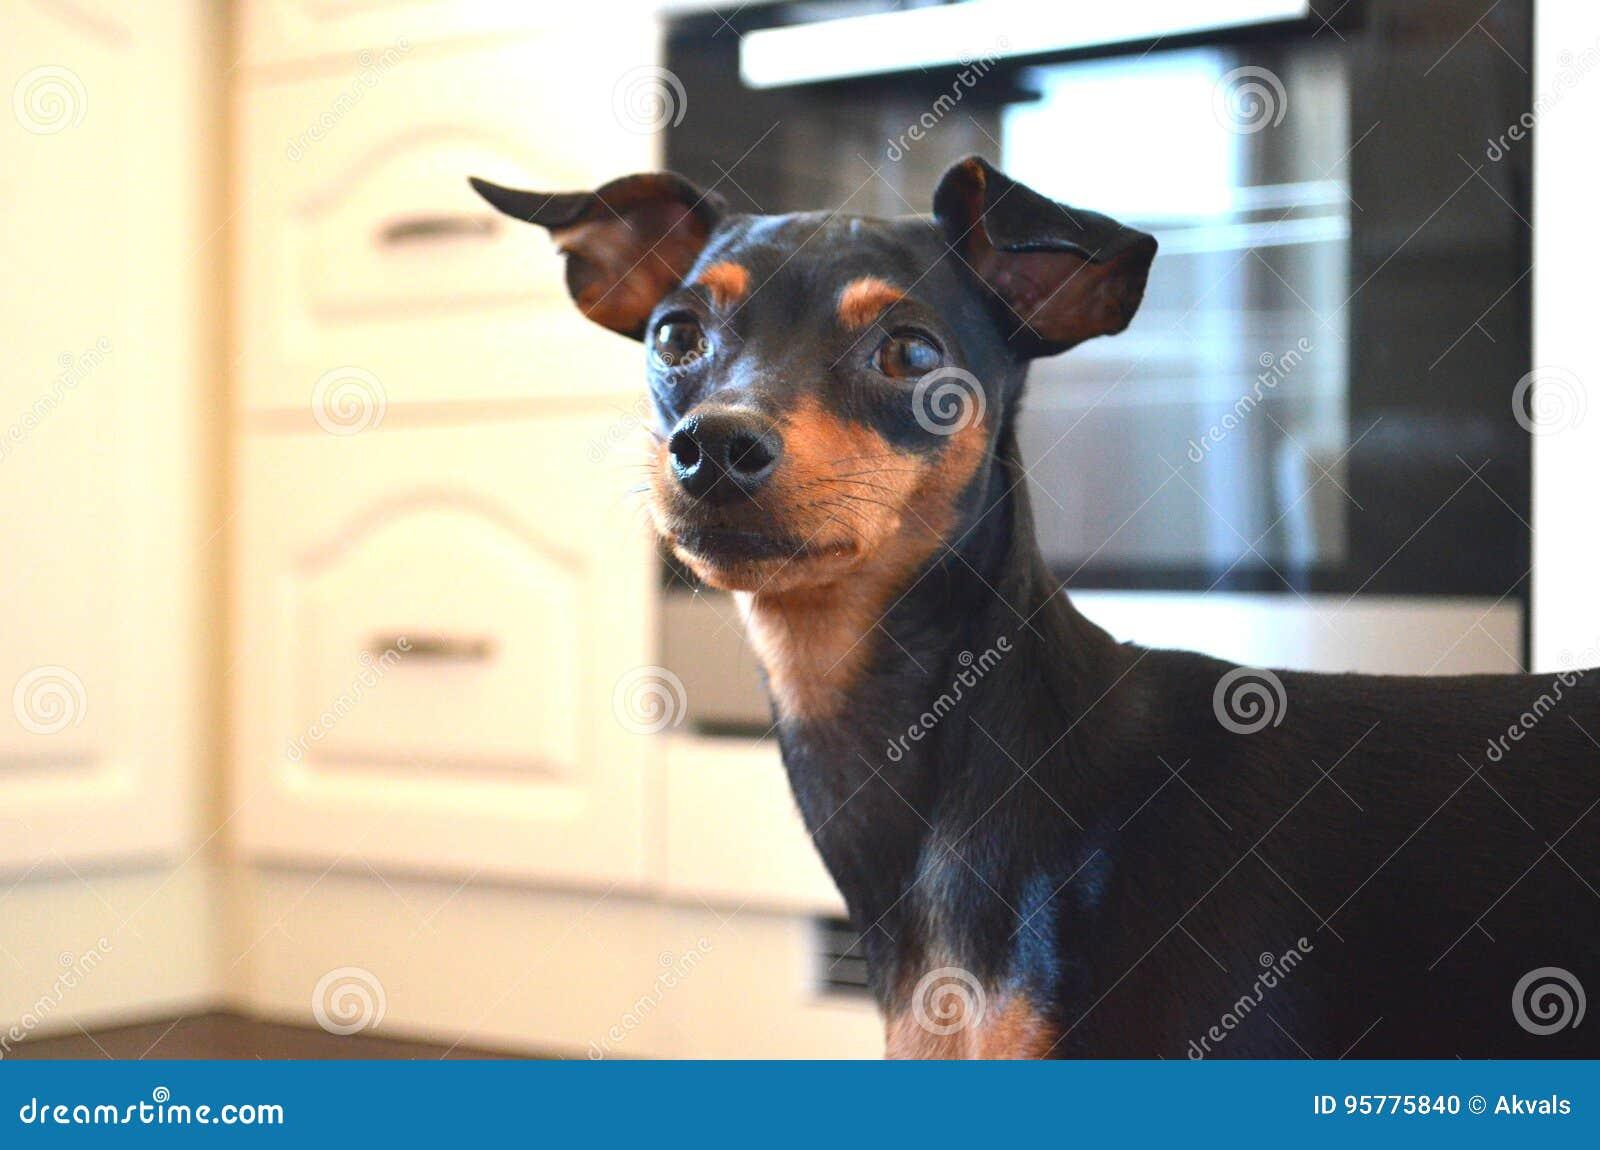 German Dog Breed Miniature Dwarf Pinscher Dog Stock Photo Image